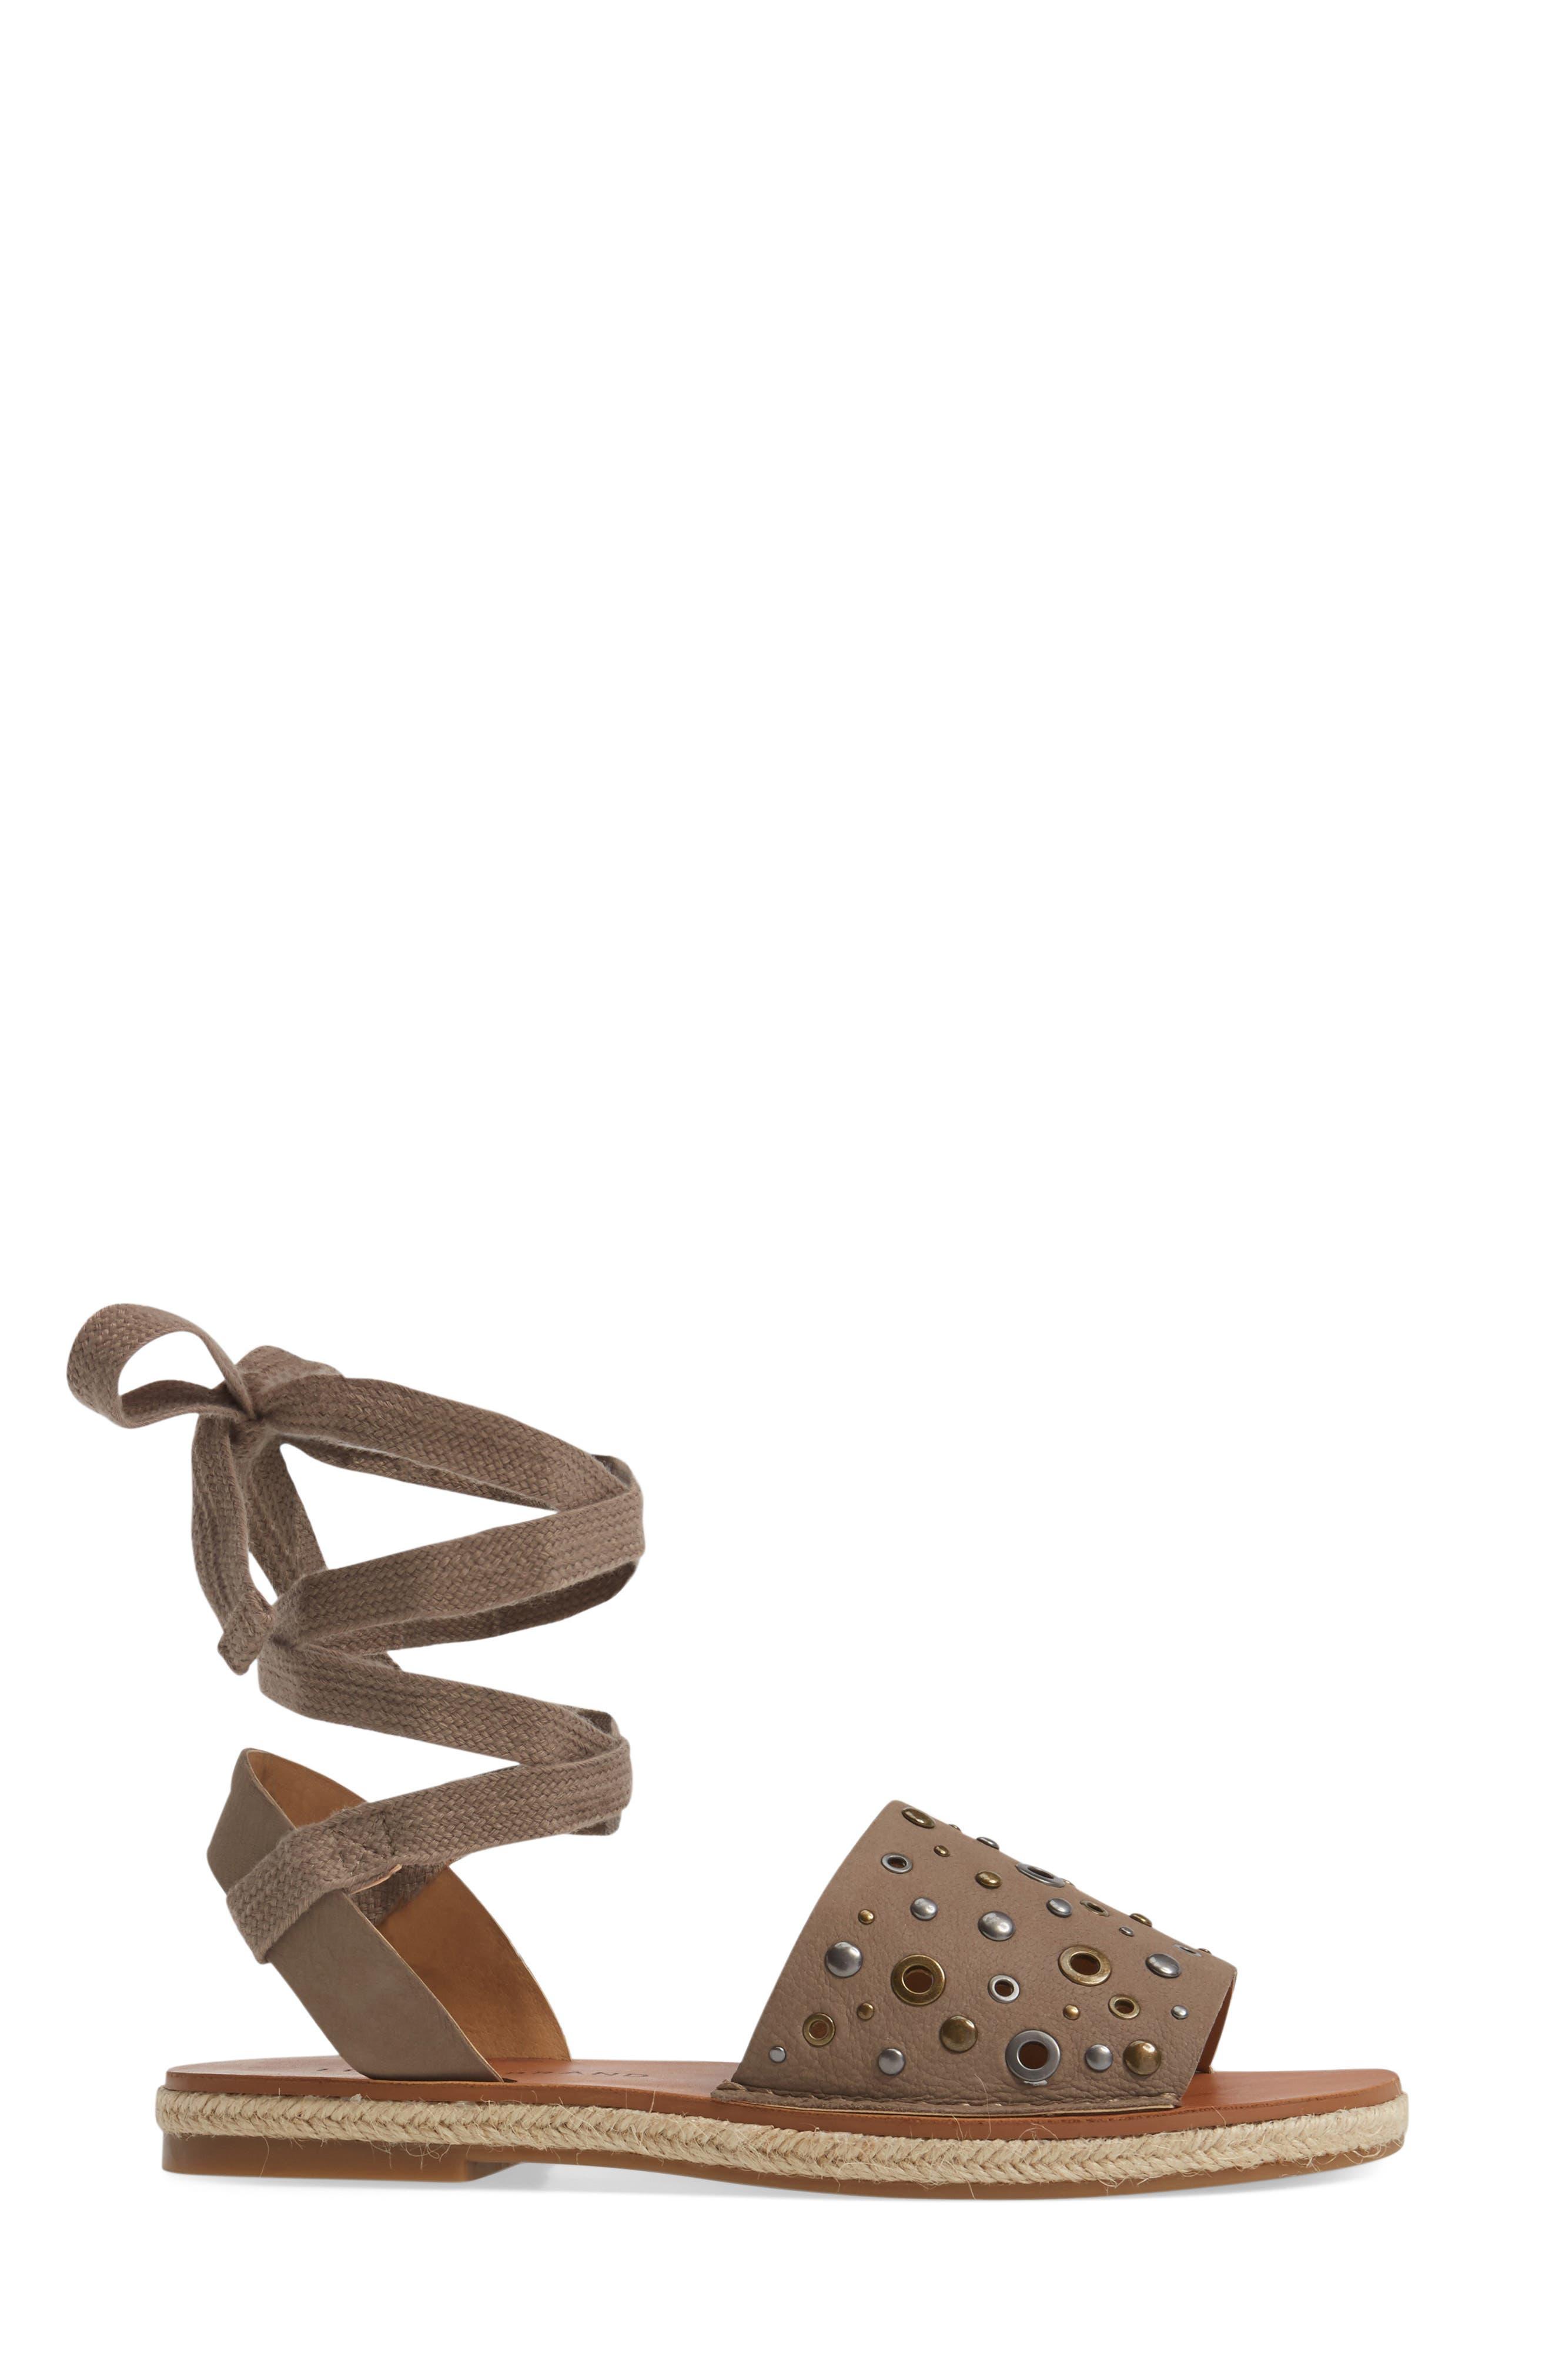 Daytah Ankle Tie Sandal,                             Alternate thumbnail 10, color,